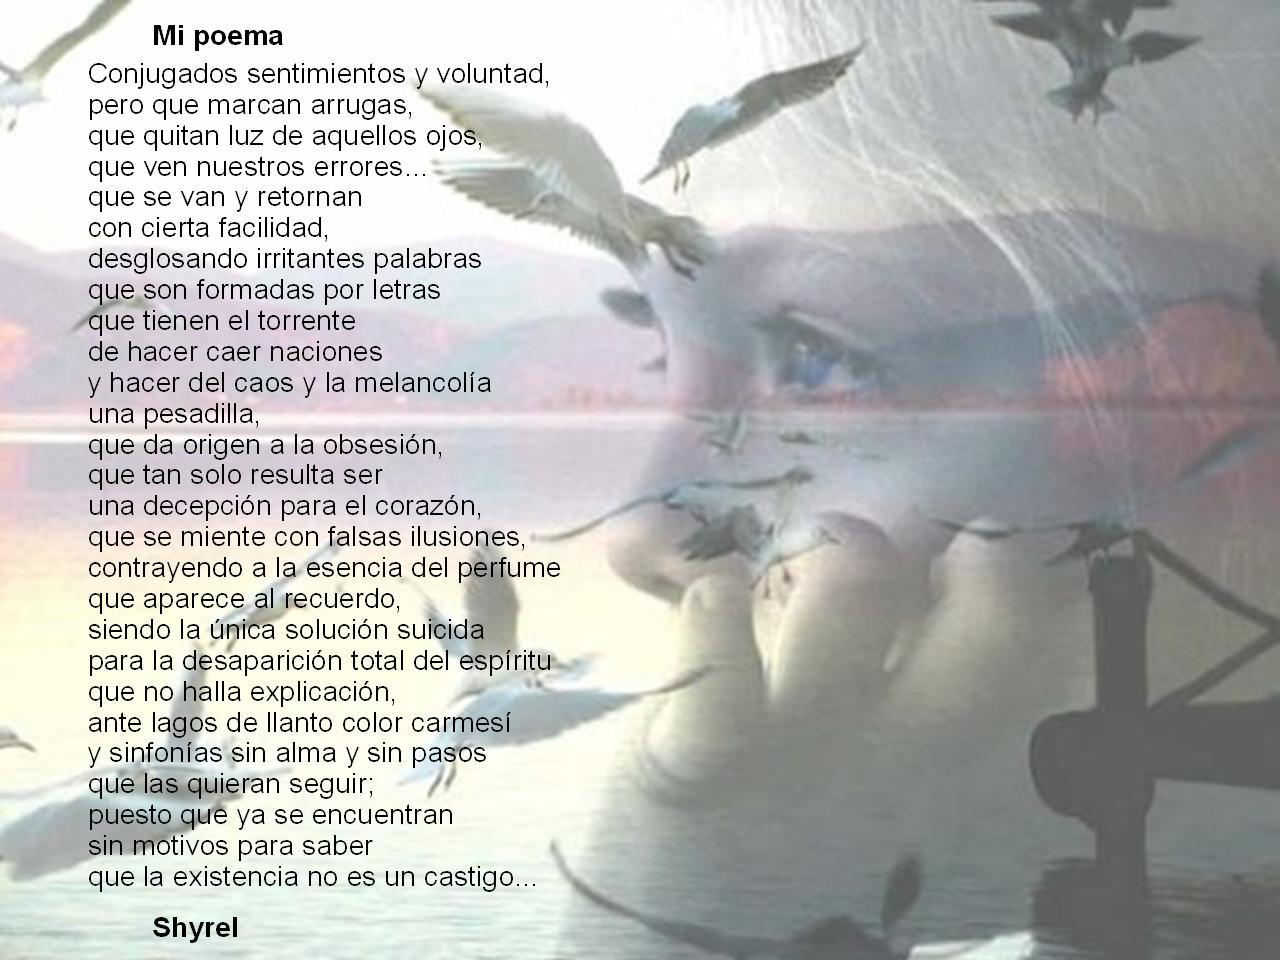 Sabina & Serrat 14) Poema de amor - YouTube